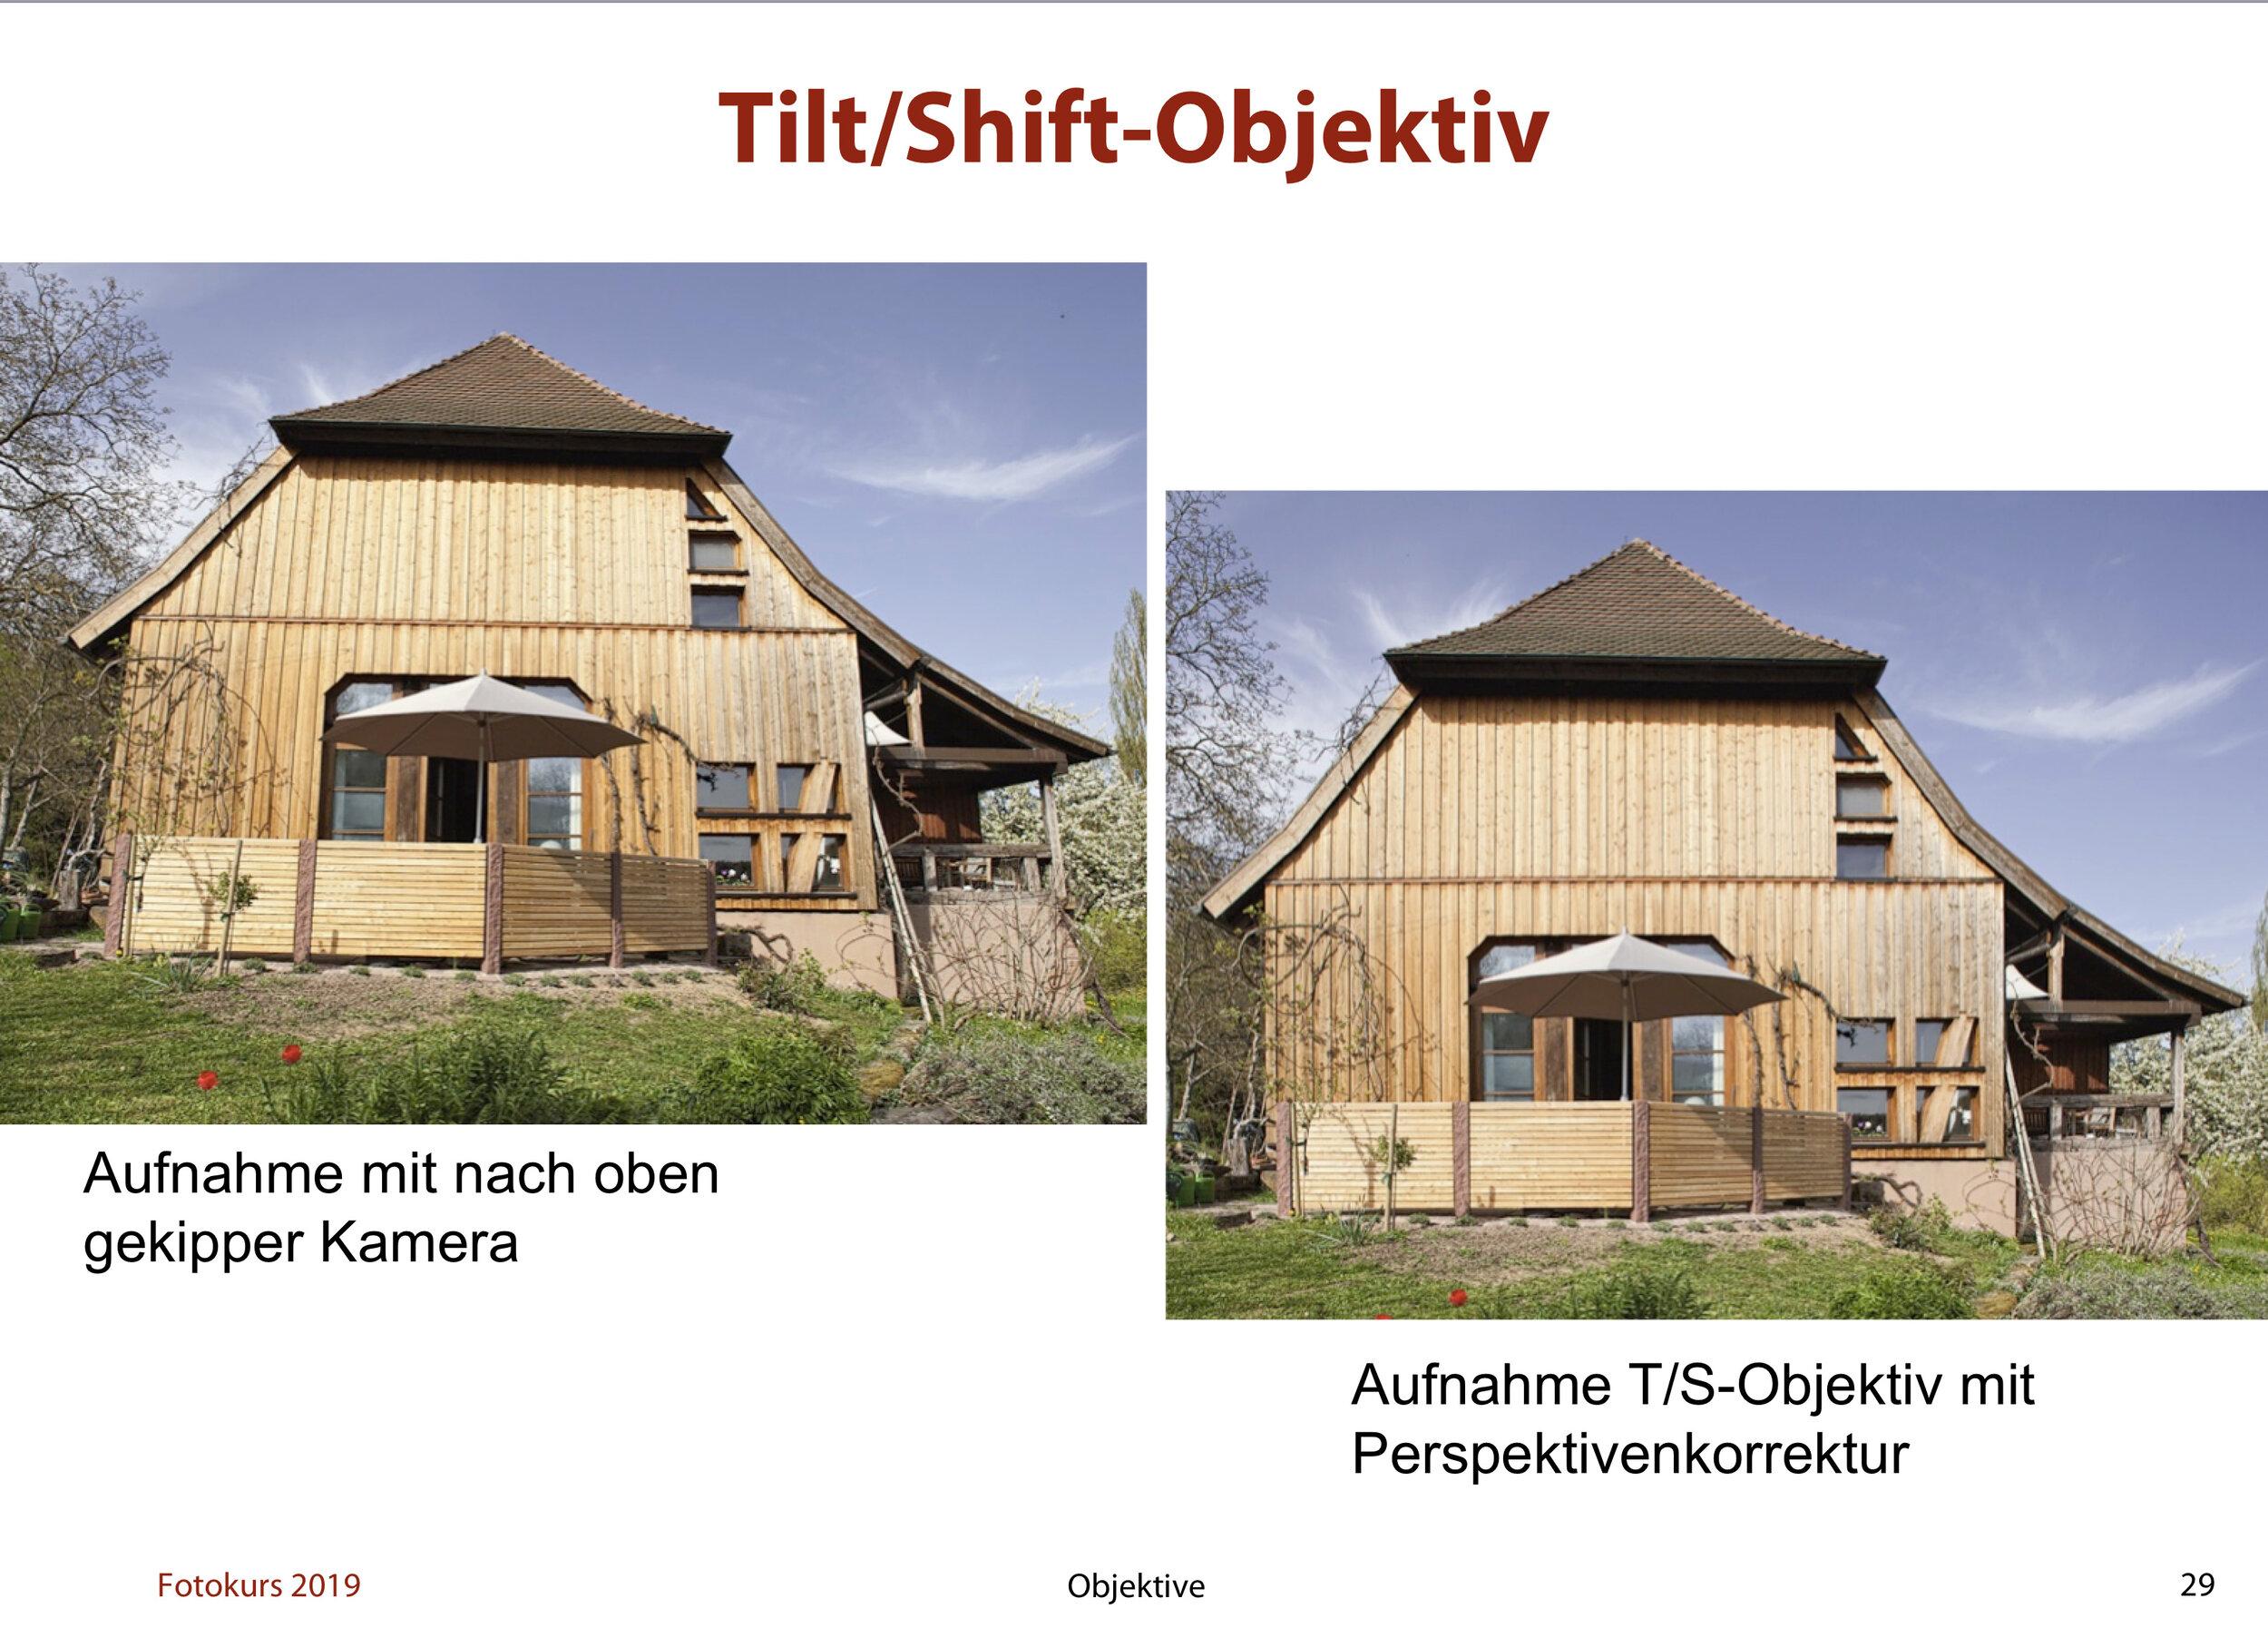 Tilt-Shift-Objektive.jpg